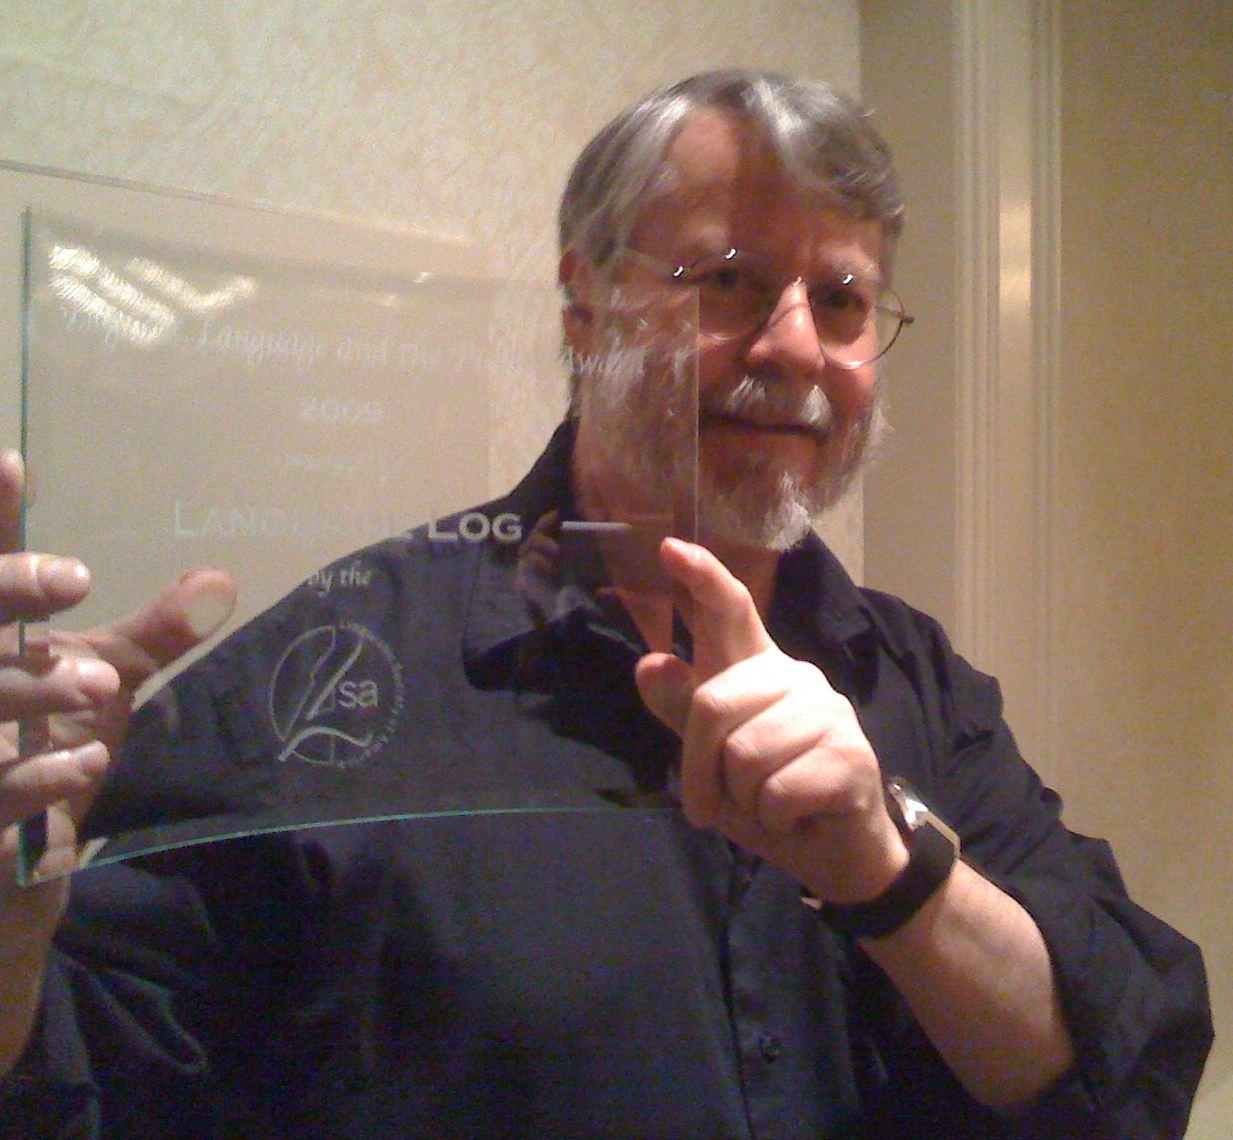 Mark with the LSA award to Language Log